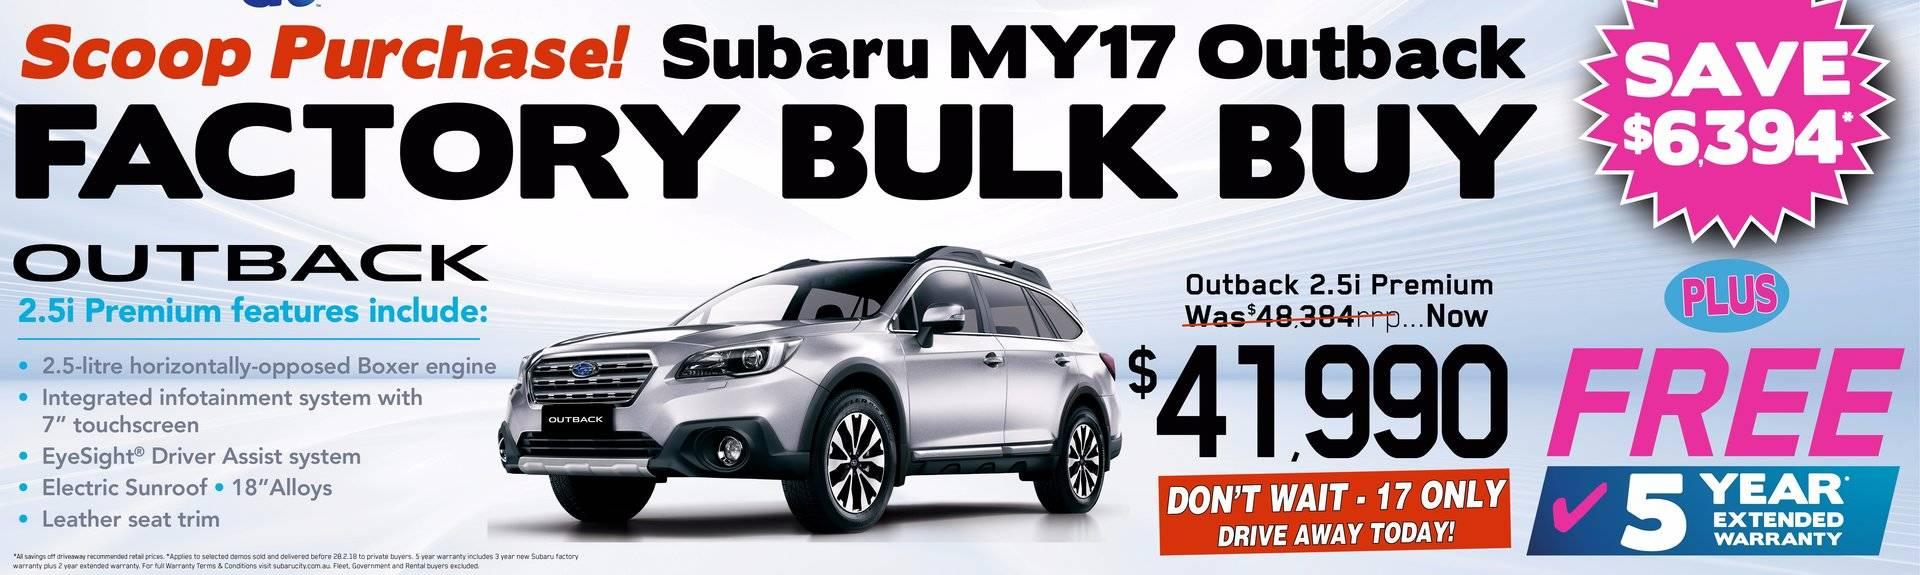 BULK Outback 2.5i Premium purchase